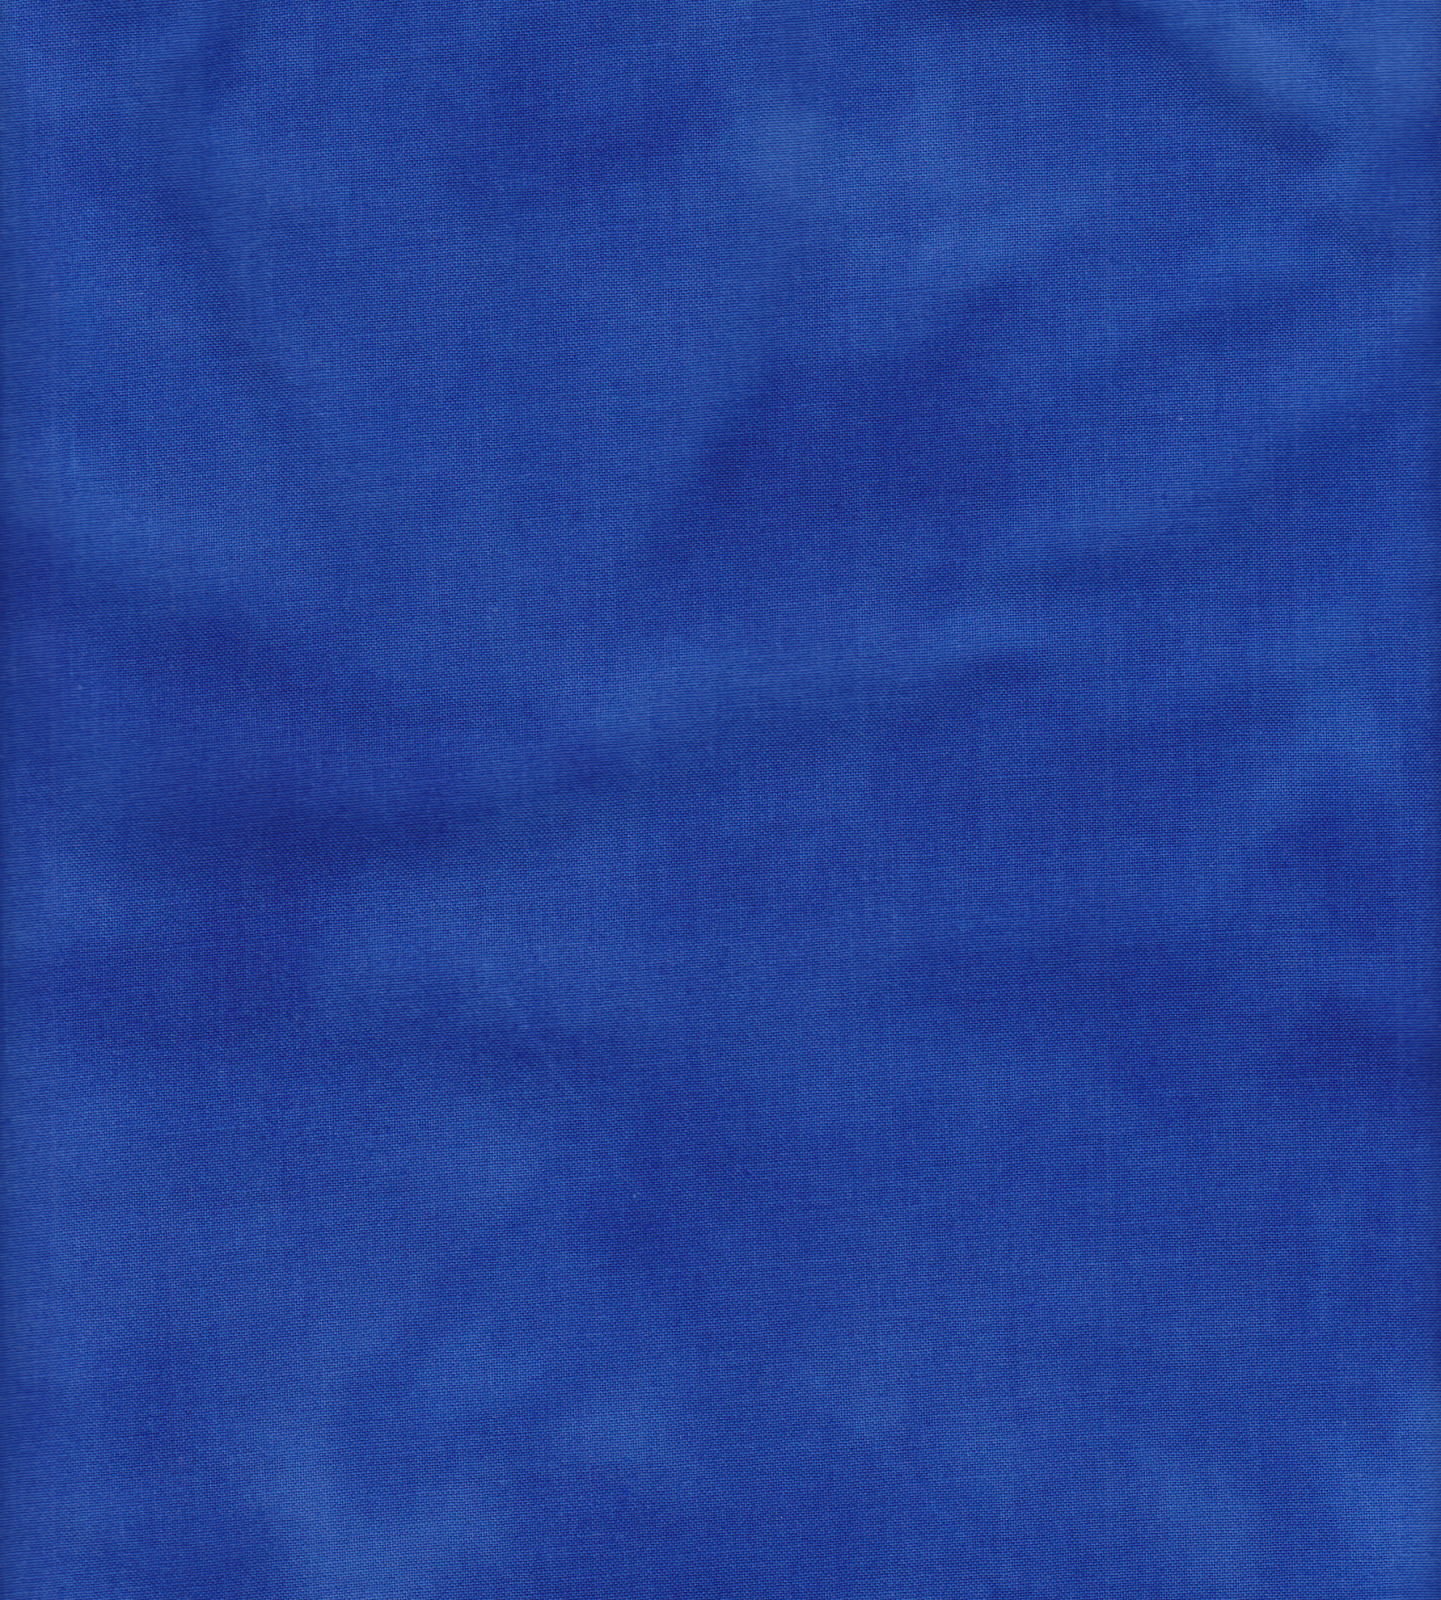 PROMO* Boundless Pre Cuts - 36414 Blue Texture